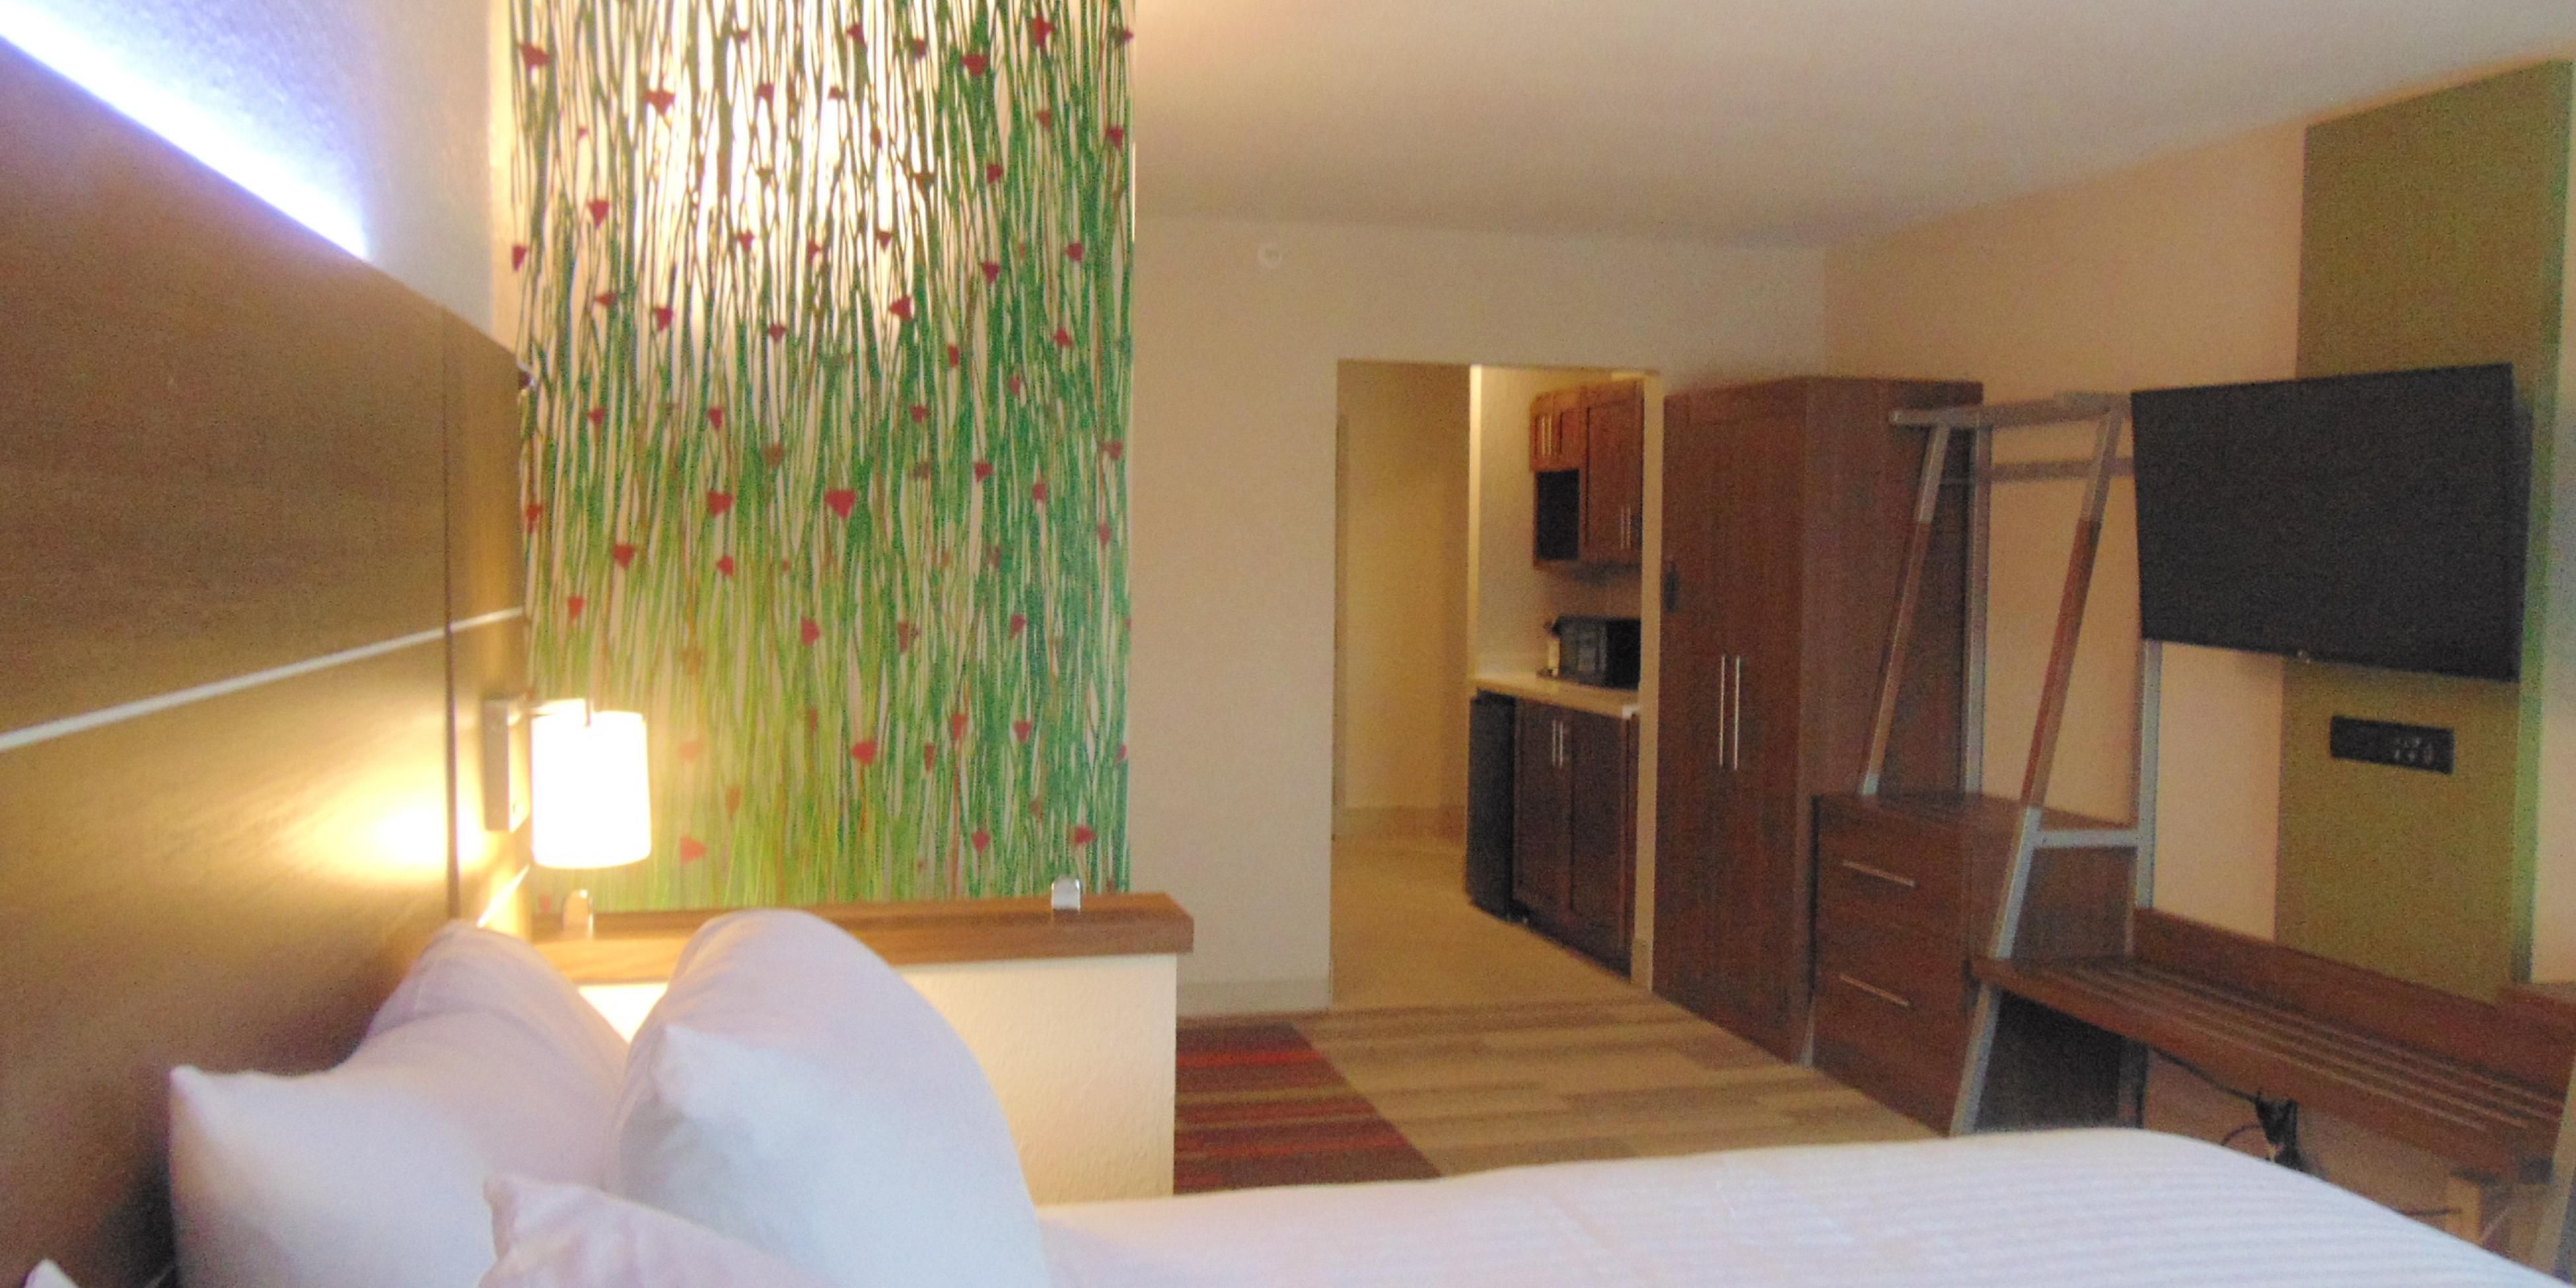 Holiday Inn Express And Suites Wapakoneta 4122670059 2x1